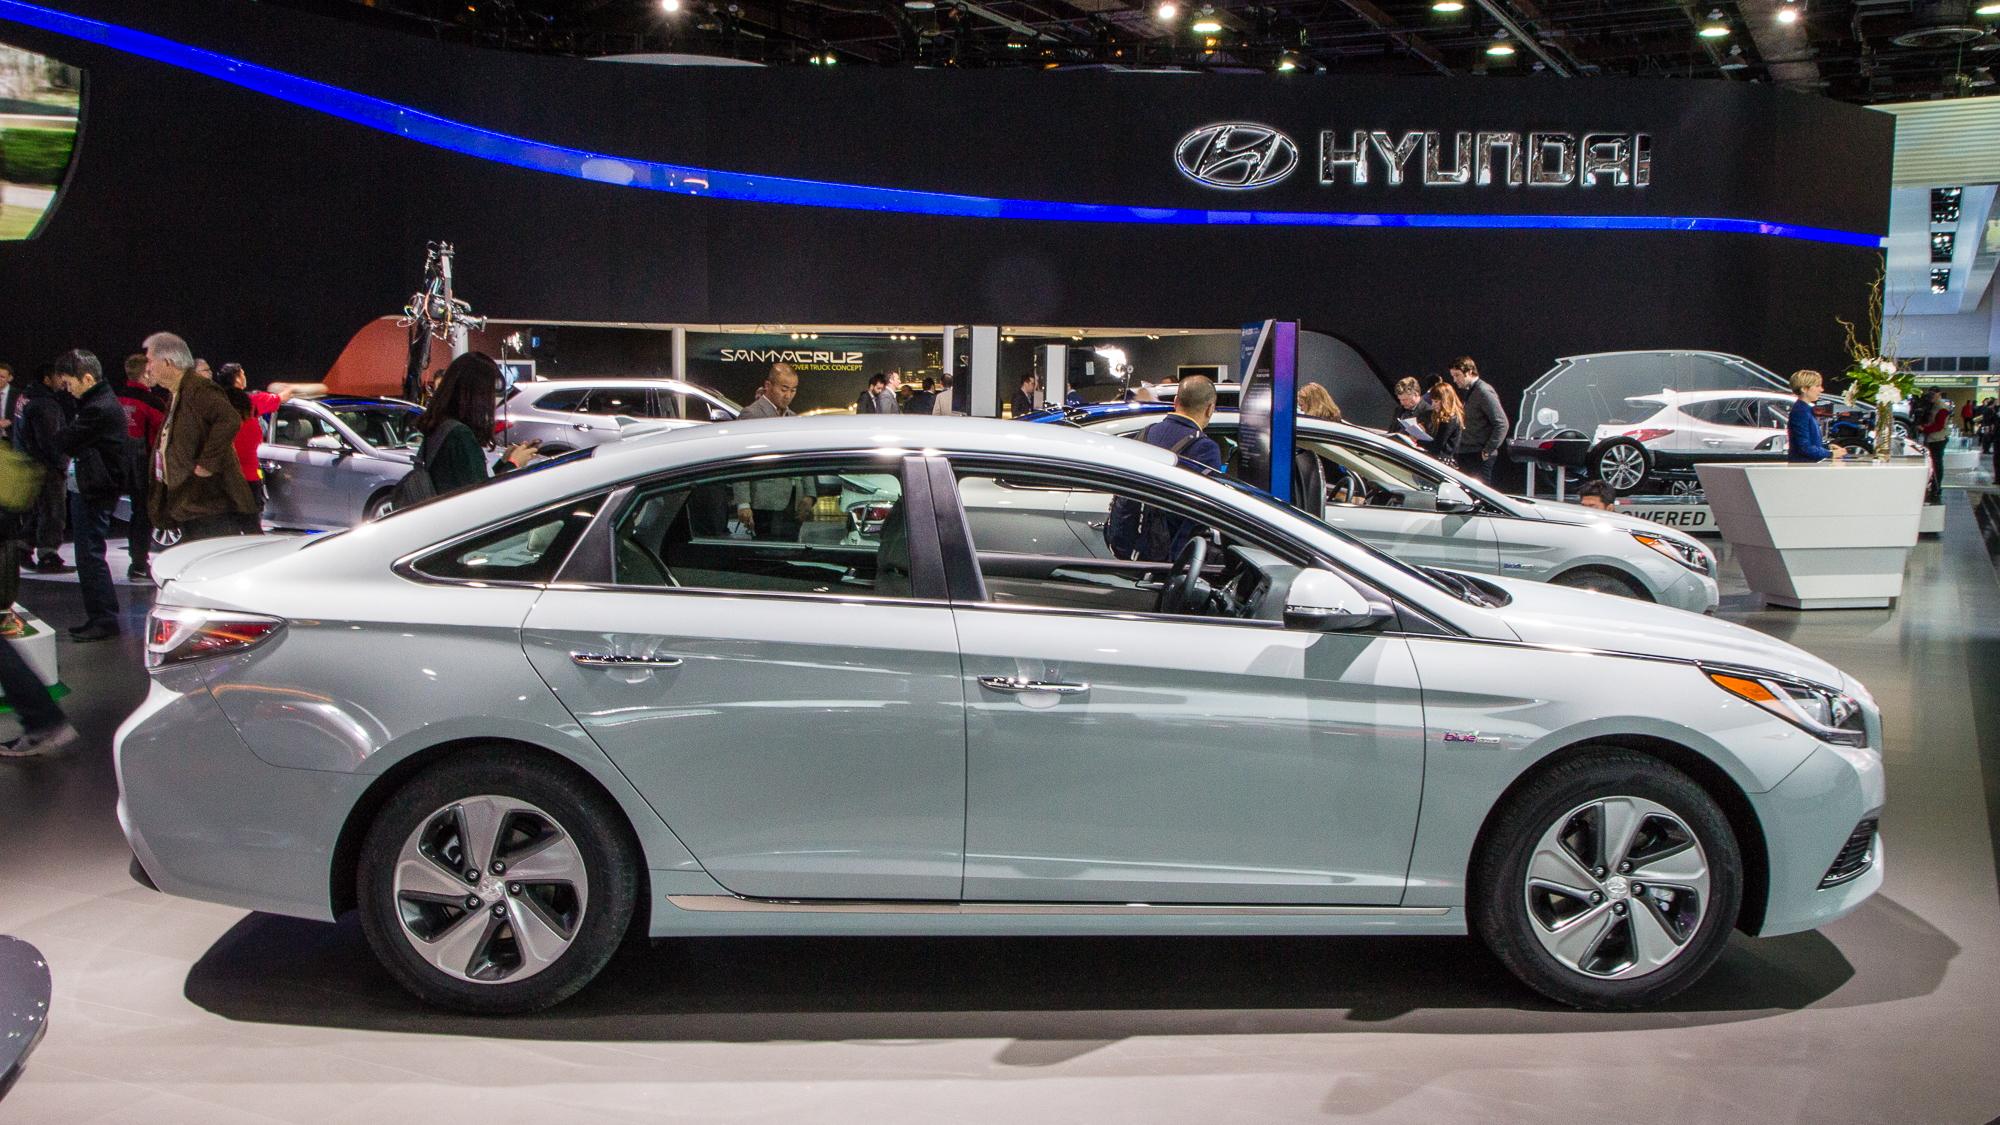 2016 Hyundai Sonata Plug-In Hybrid live photos, 2015 Detroit Auto Show